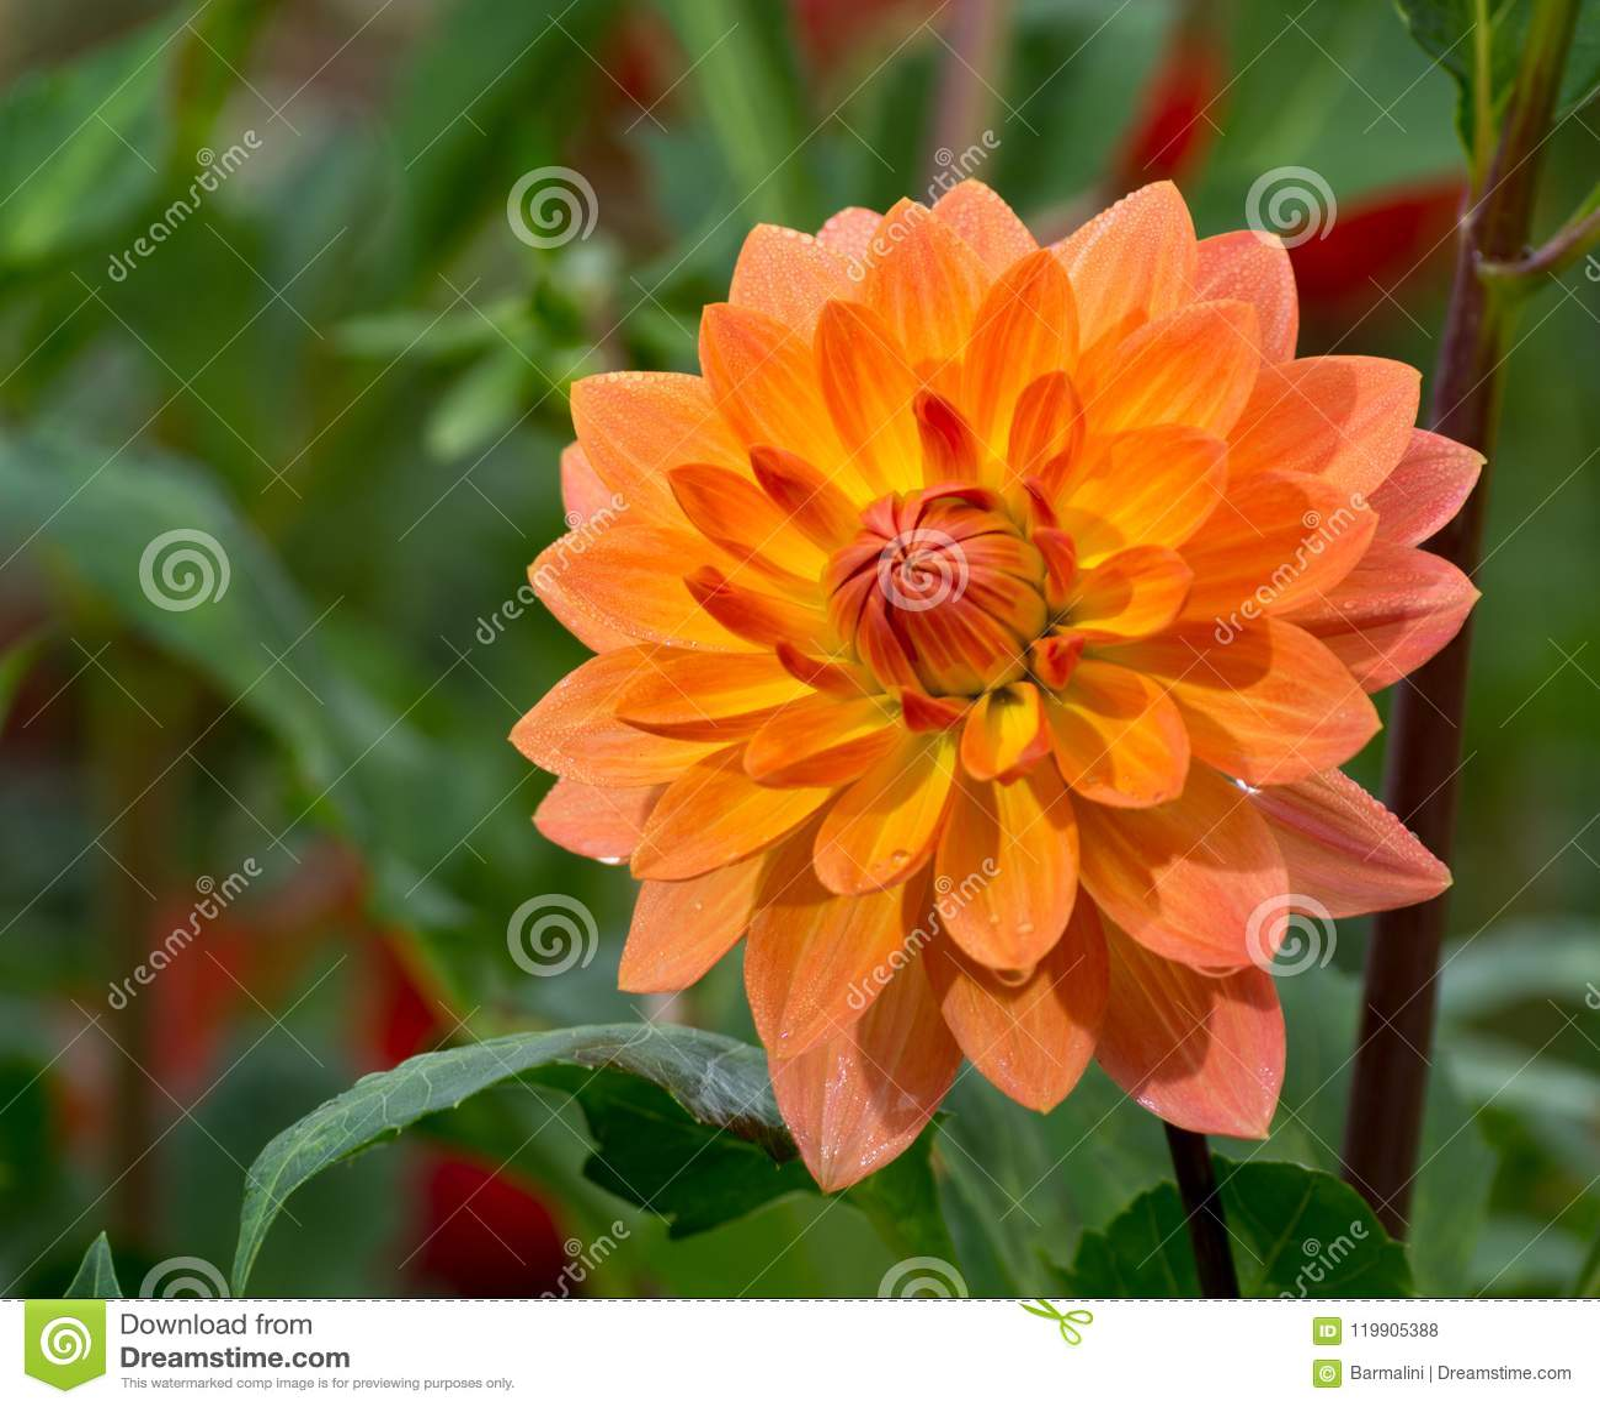 Salmon Orange Dahlia Flower Beatyful Bouquet Or Decoration From